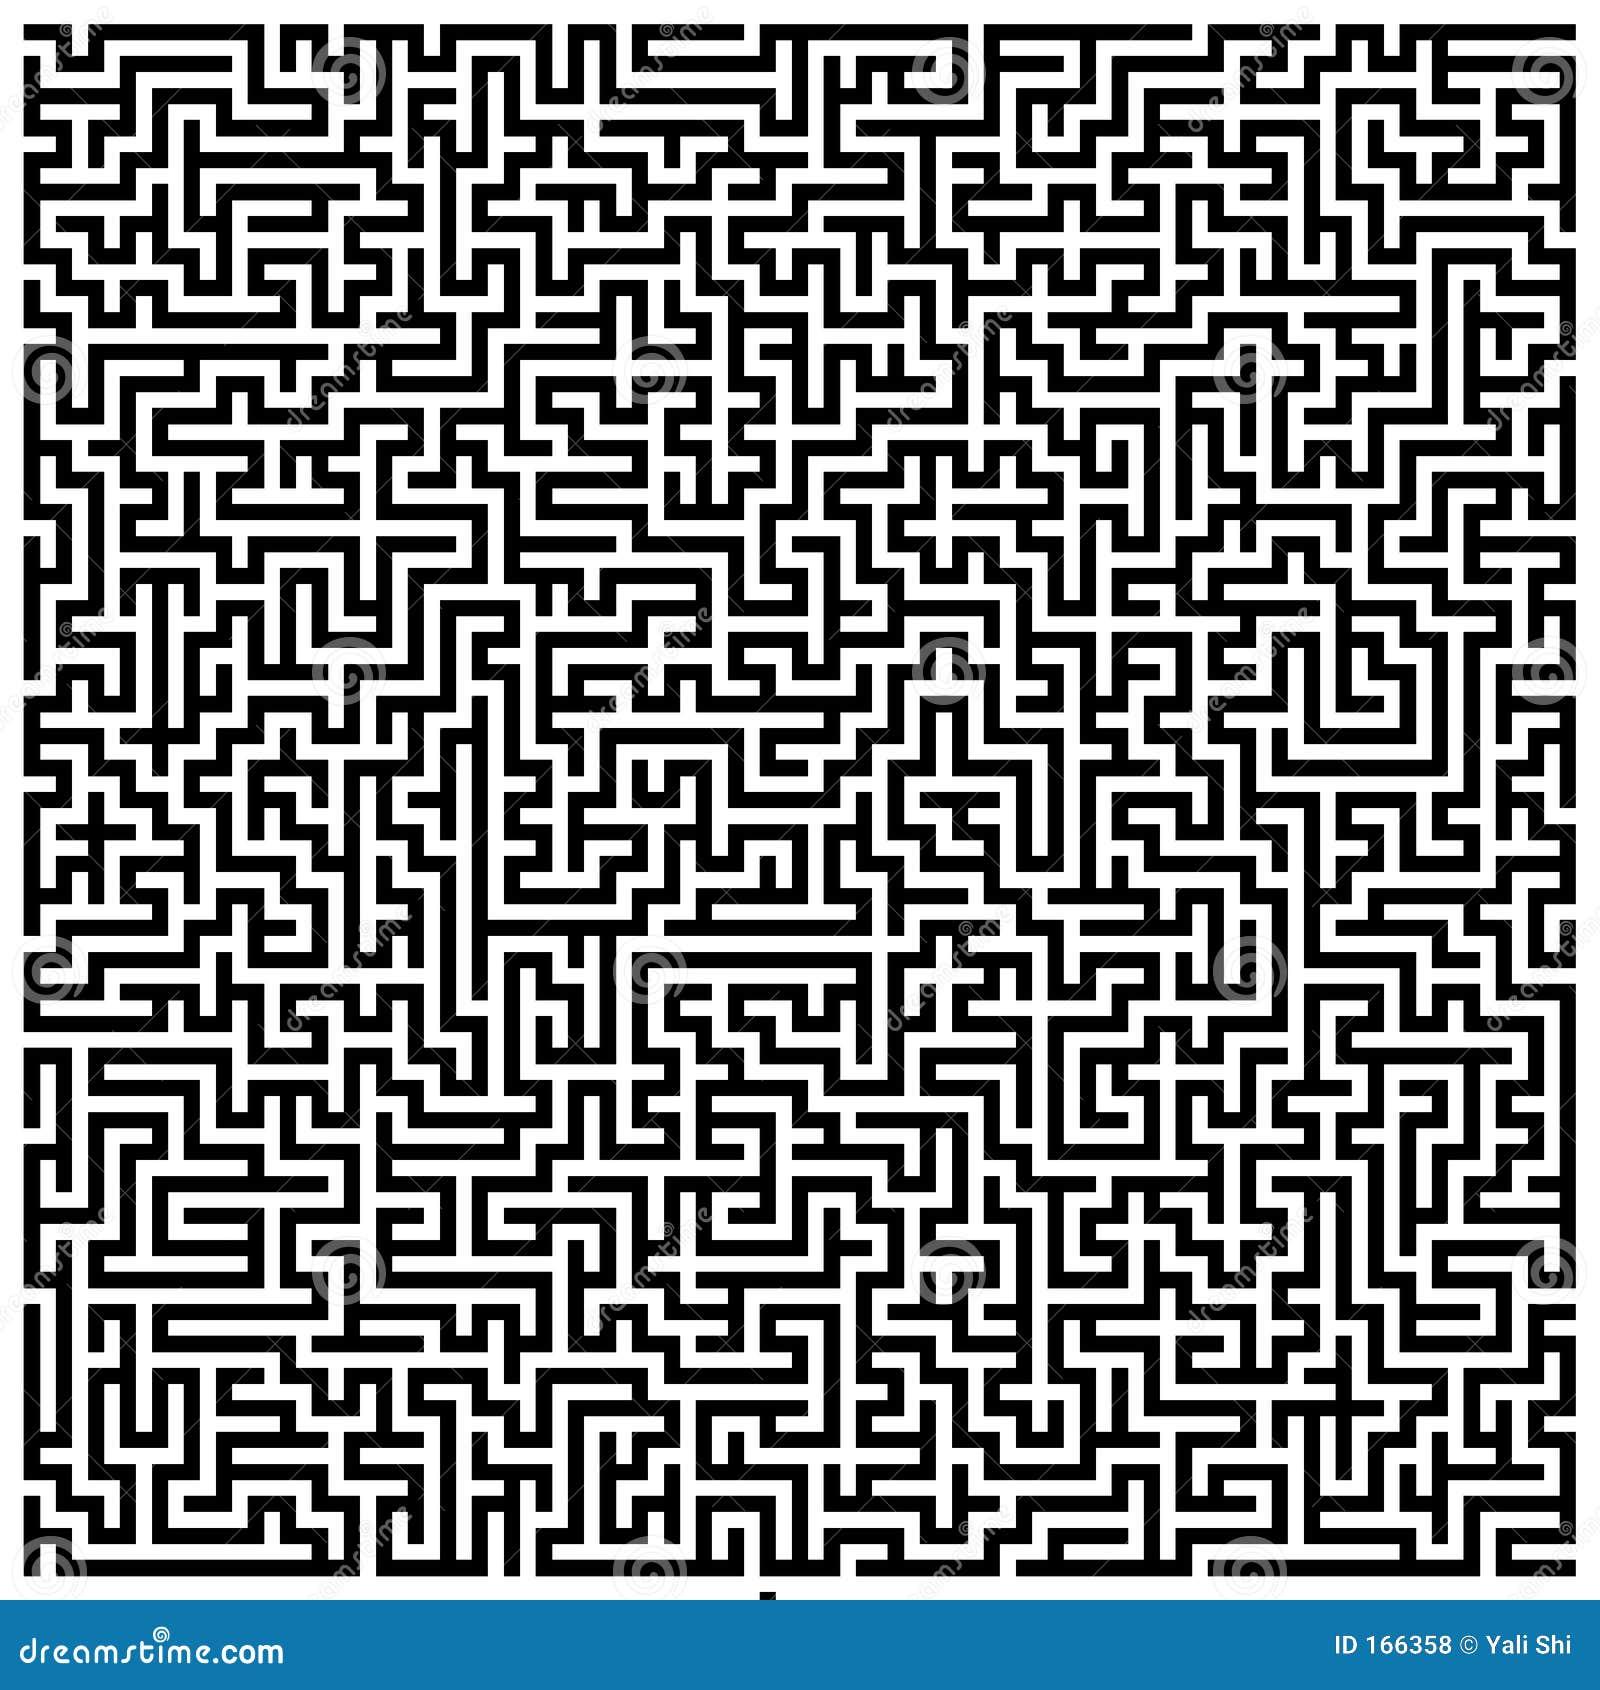 Intricate Maze